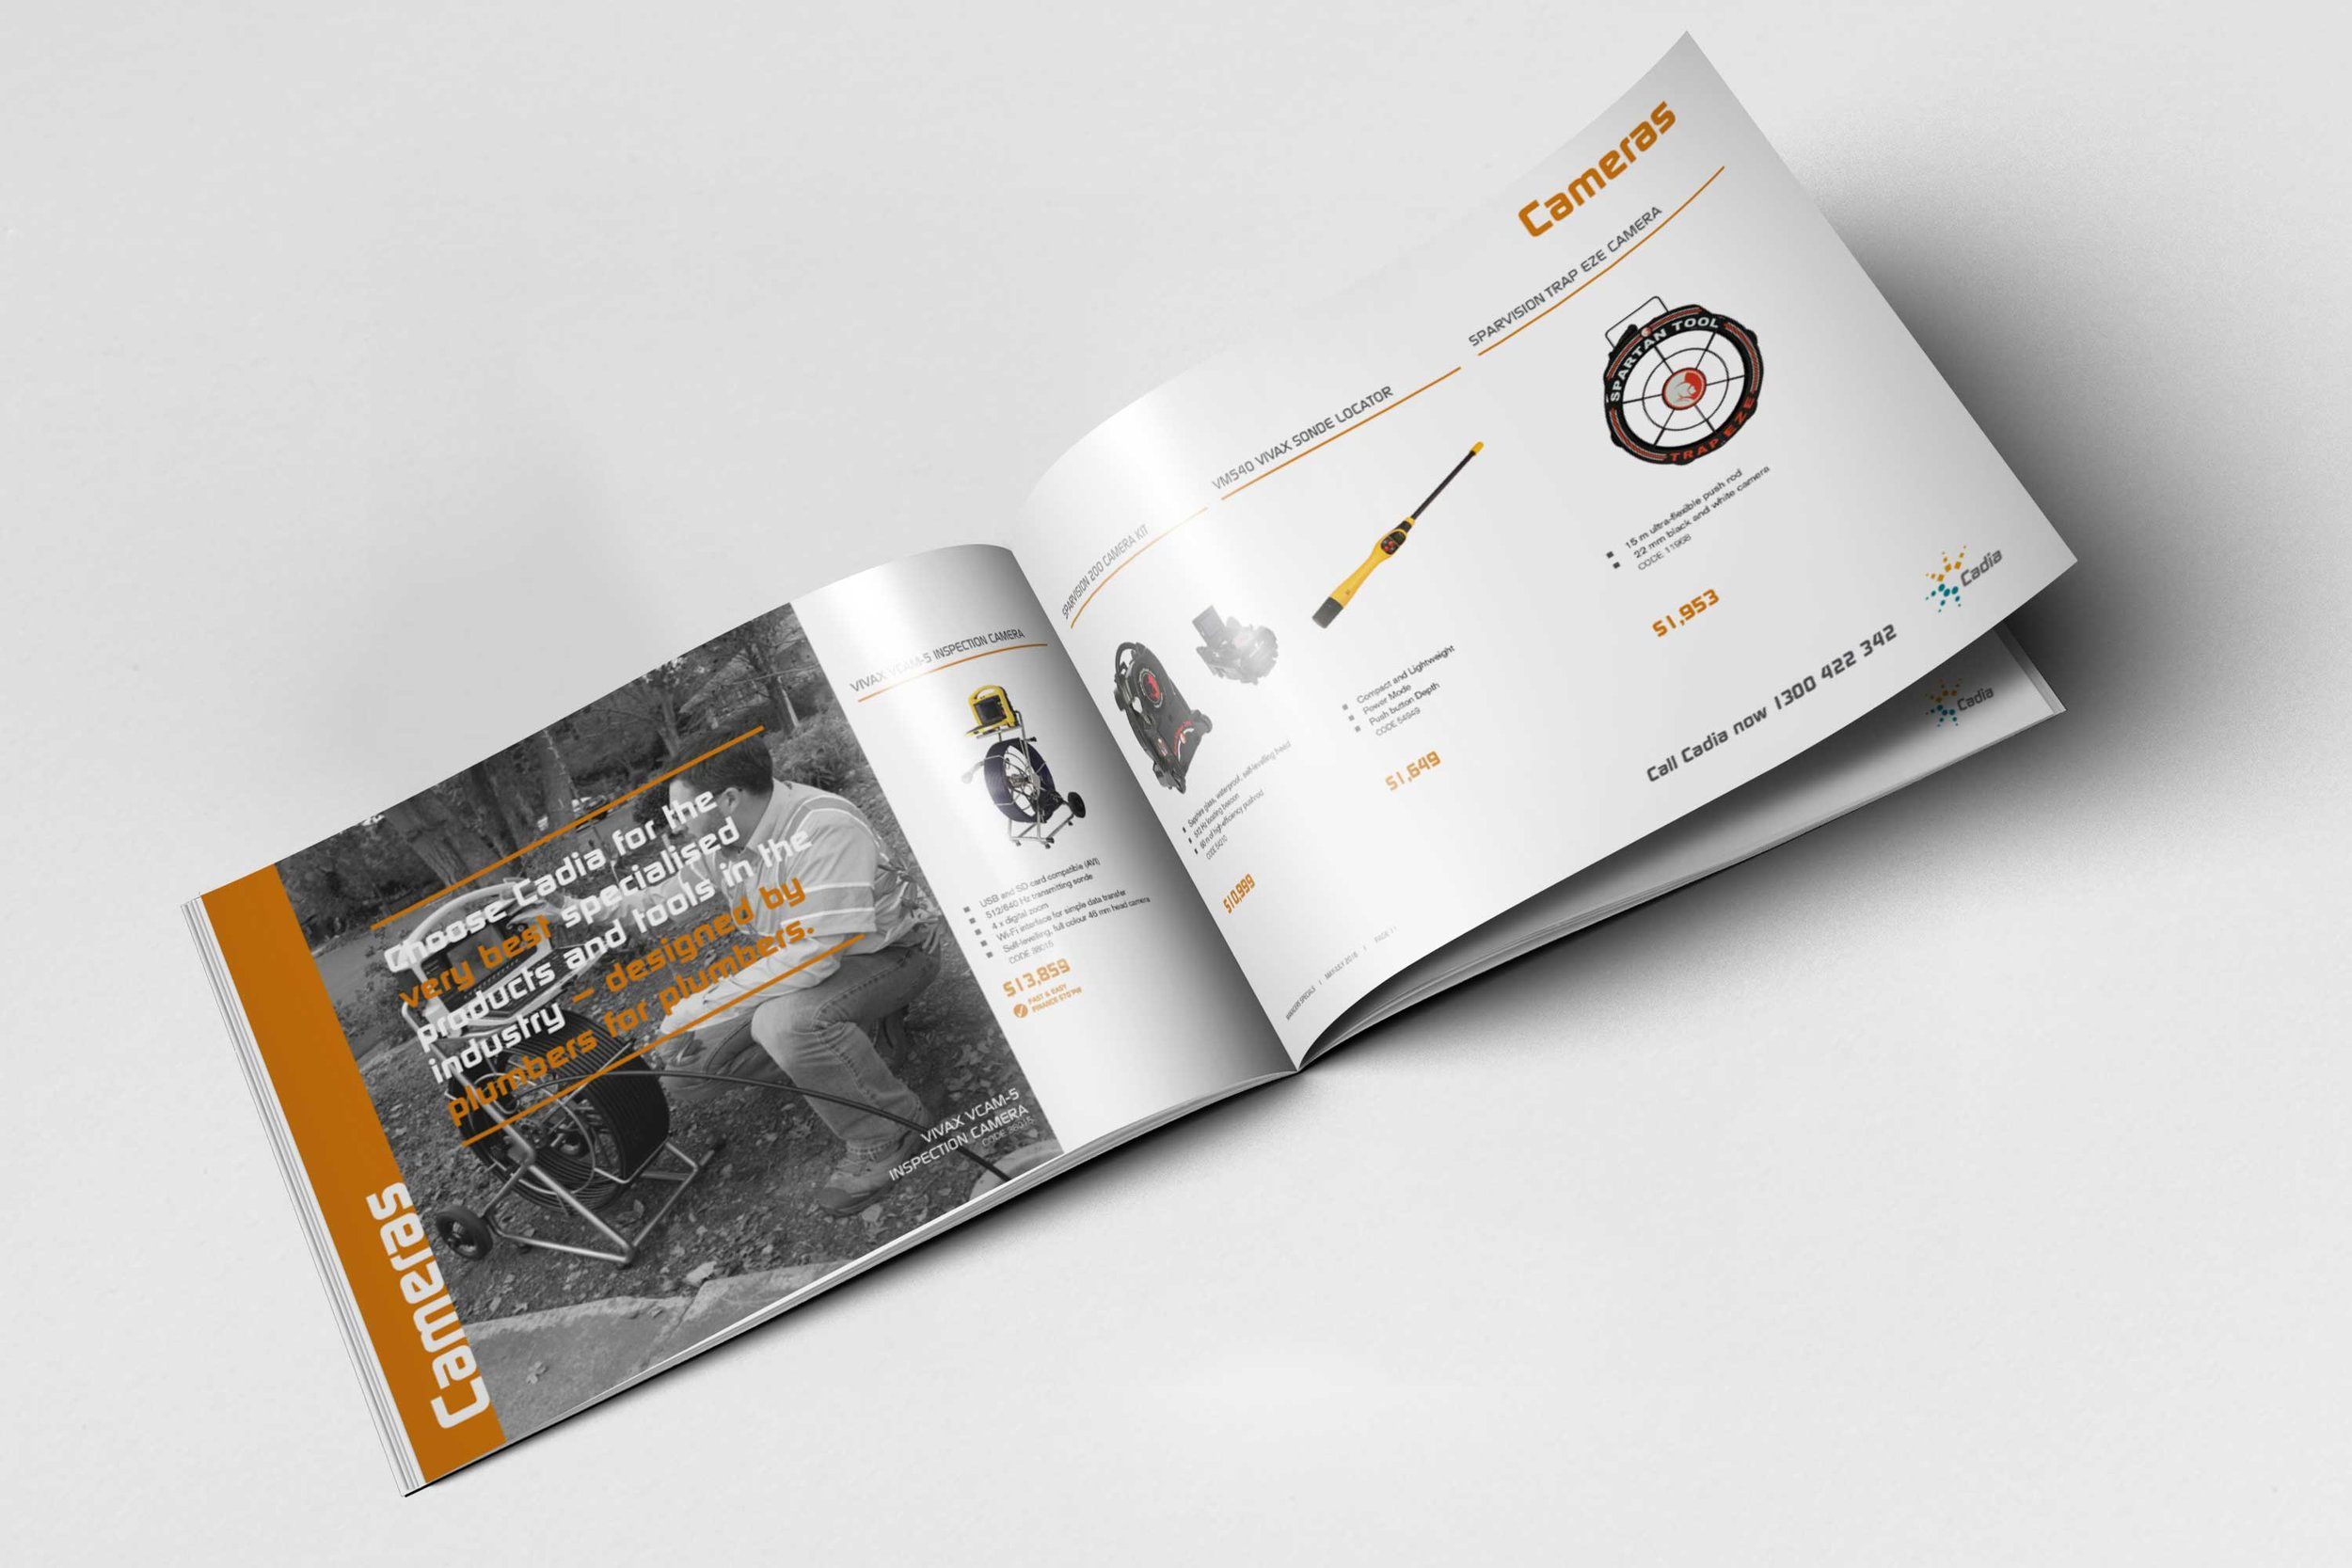 Cadia_Brochure_Camera_Pages.jpg